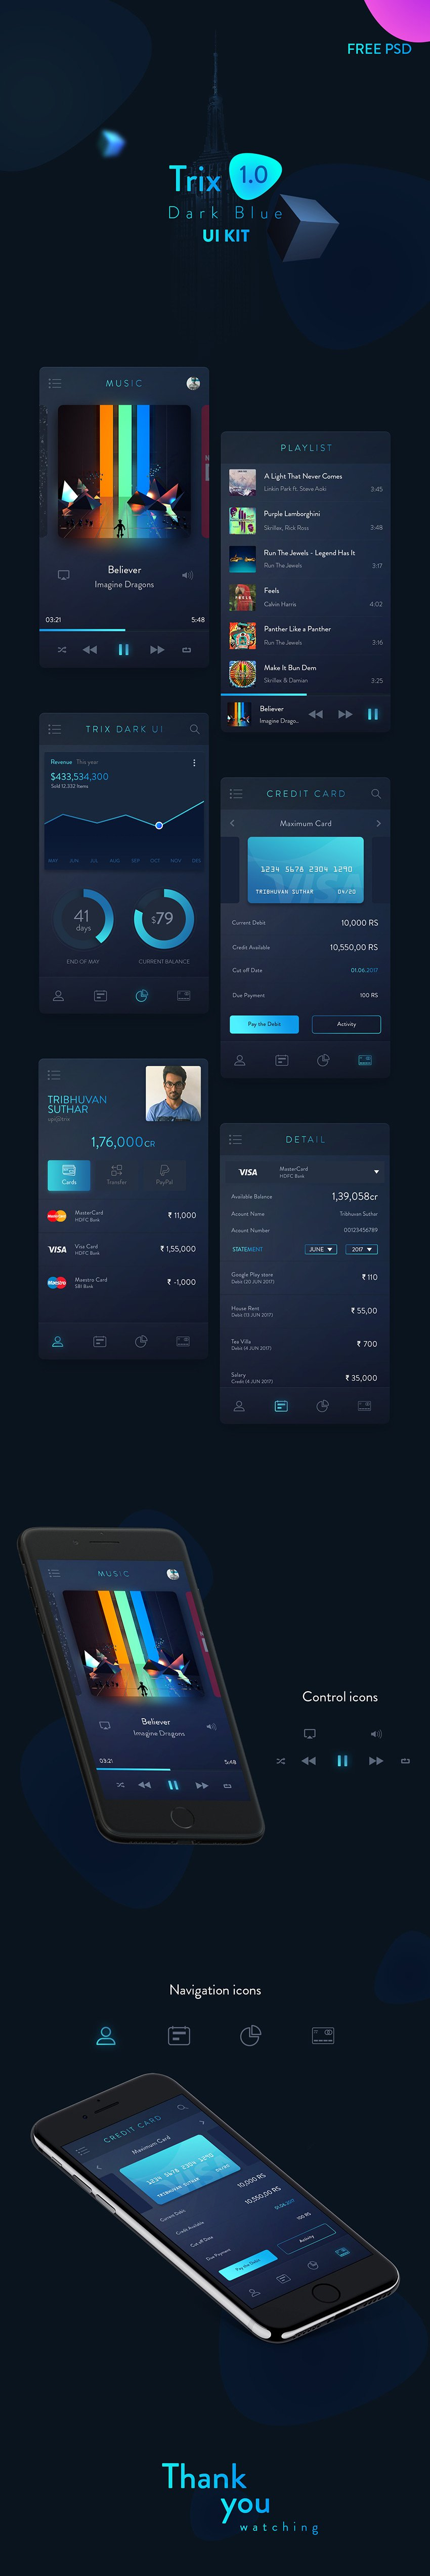 Trix Dark App Design UI Kit - Personal Banking App Design